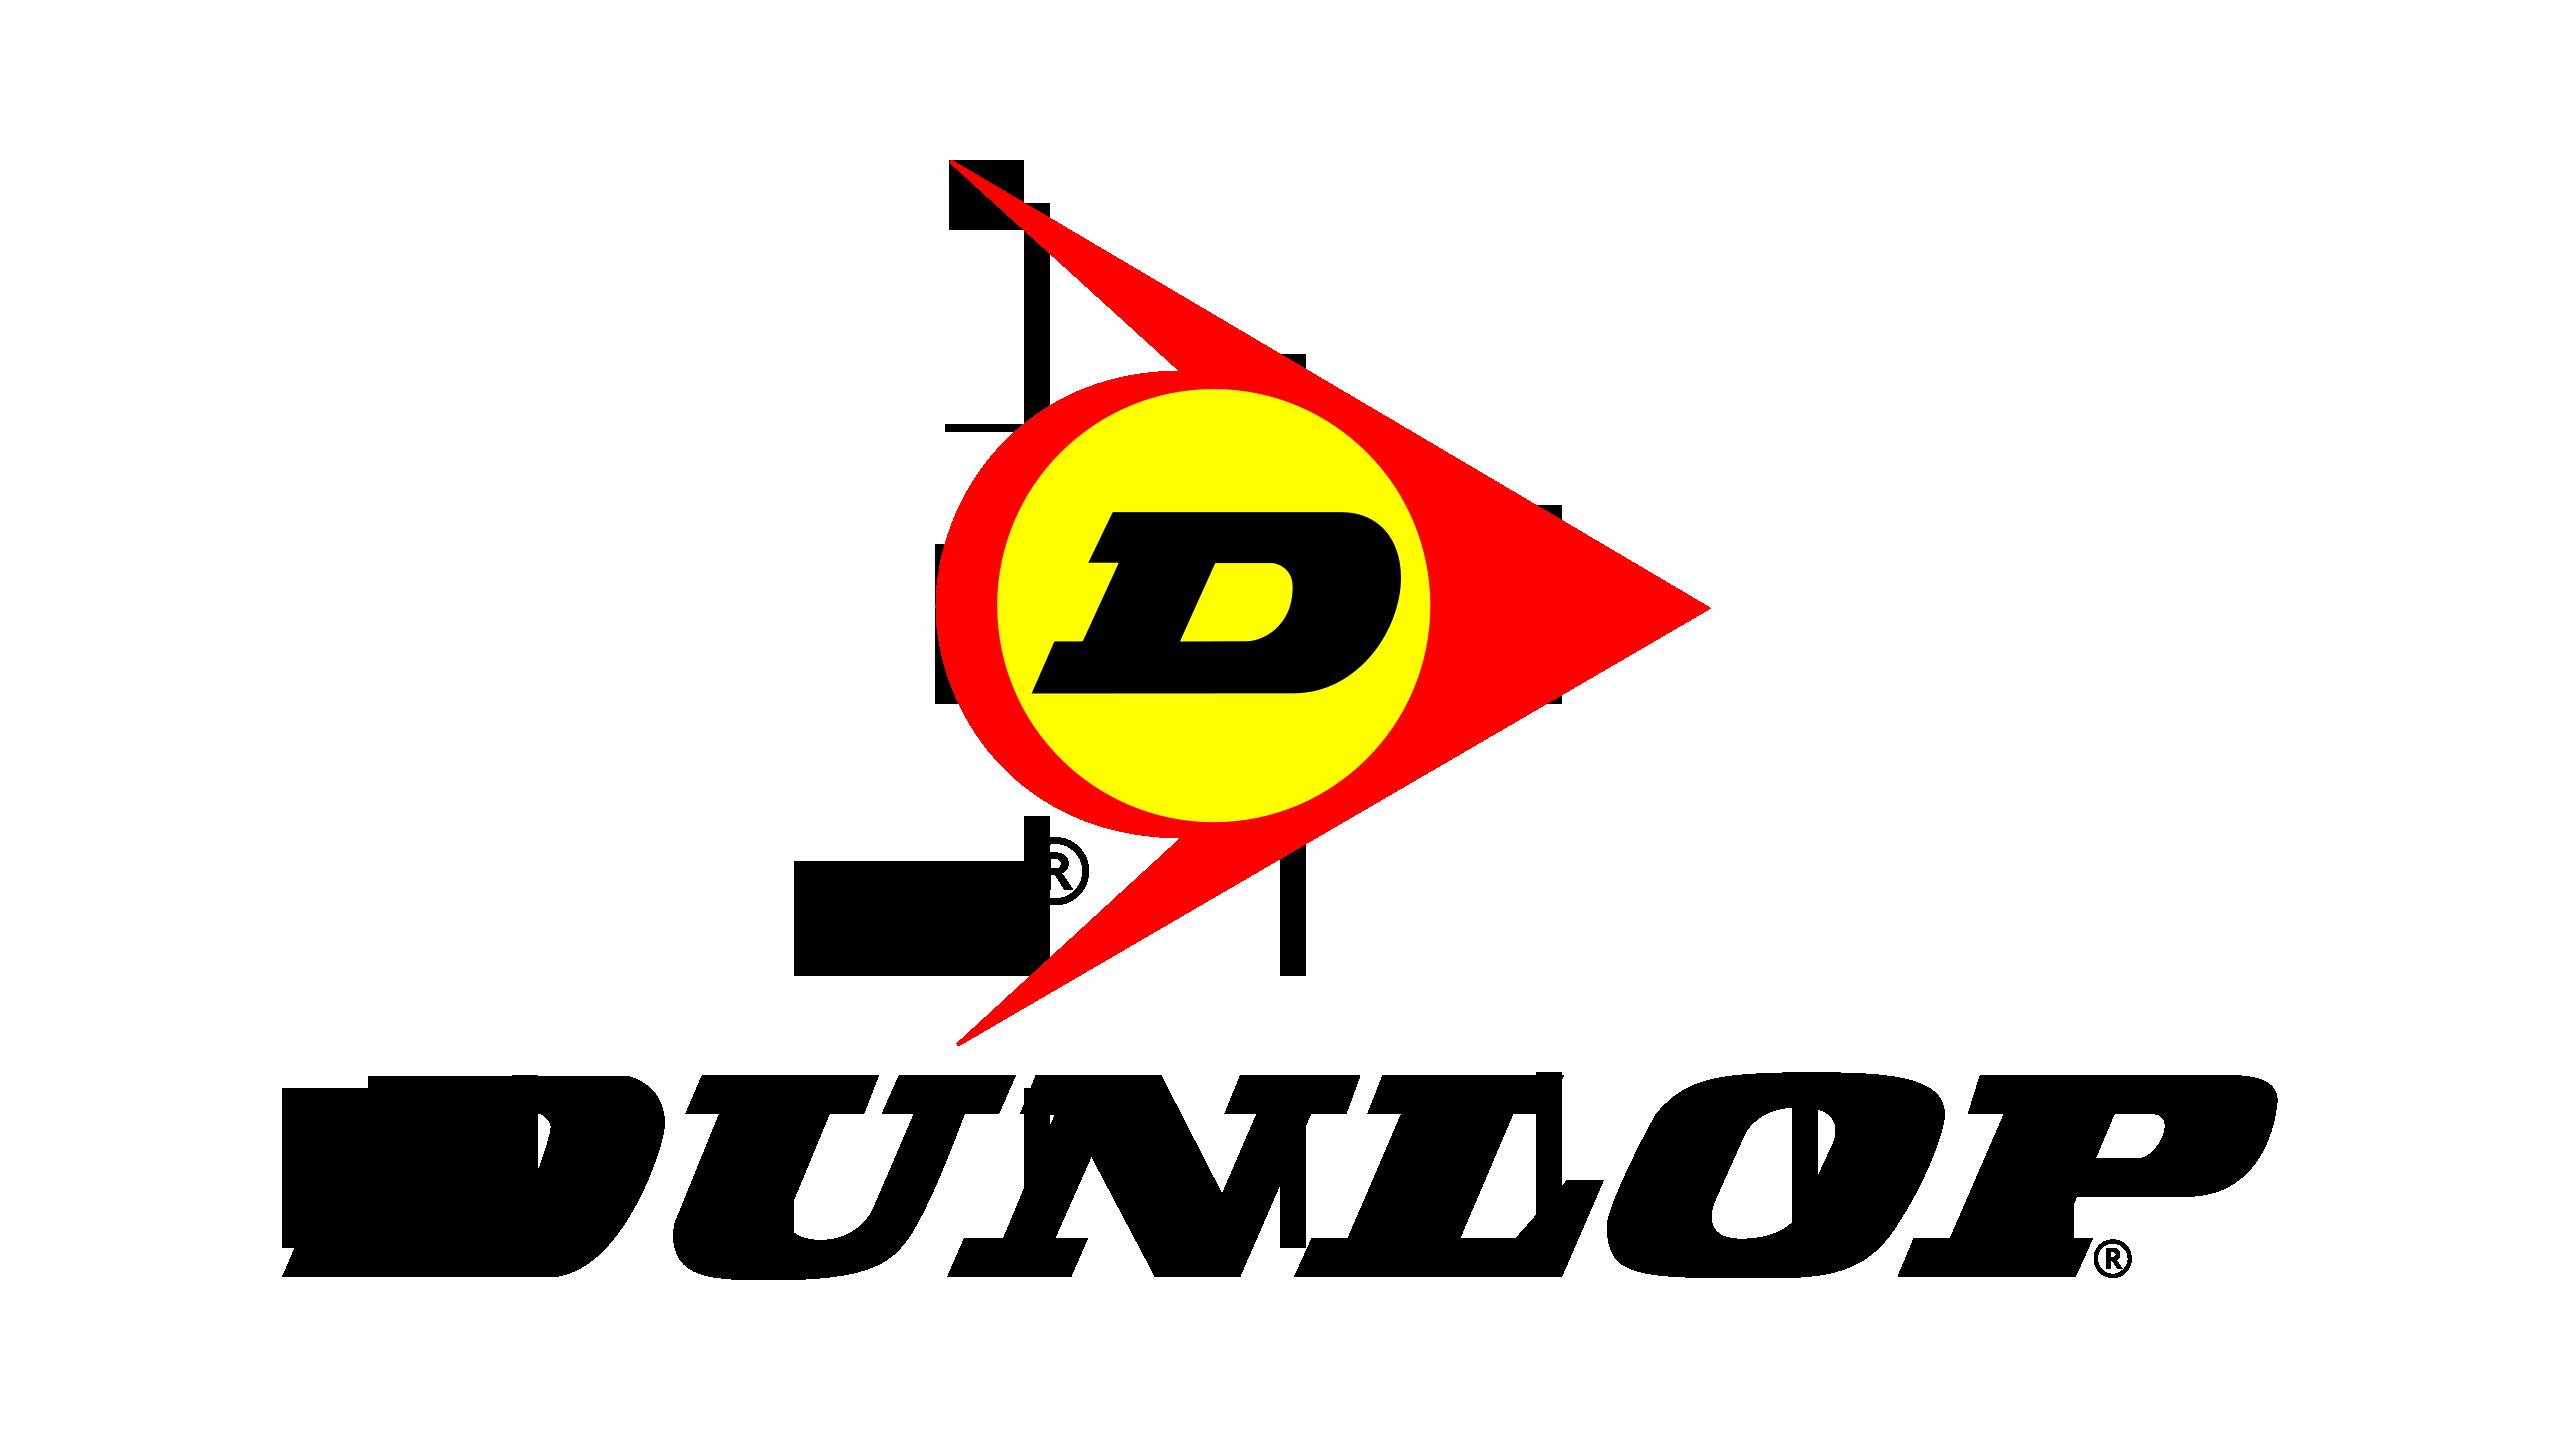 http://www.carlogos.org/tire-brands-logos/Dunlop-logo-2560x1440.png